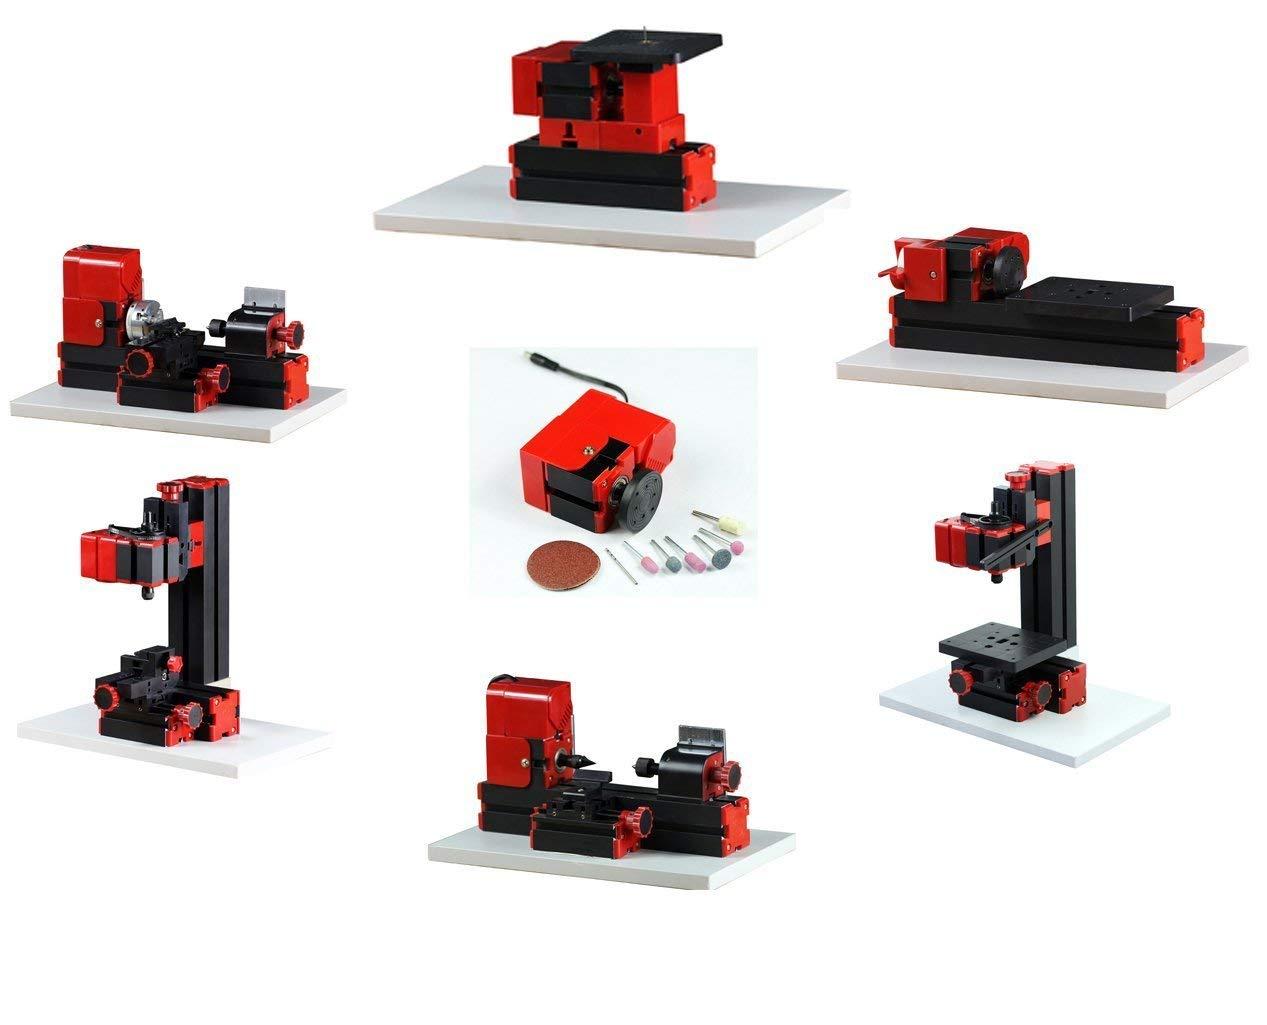 Mini Multipurpose Machine 6 In 1 Kit Wood Soft Metal Woodworking DIY Tool Lathe Machine Kit For Hobby Amateur Model Maker